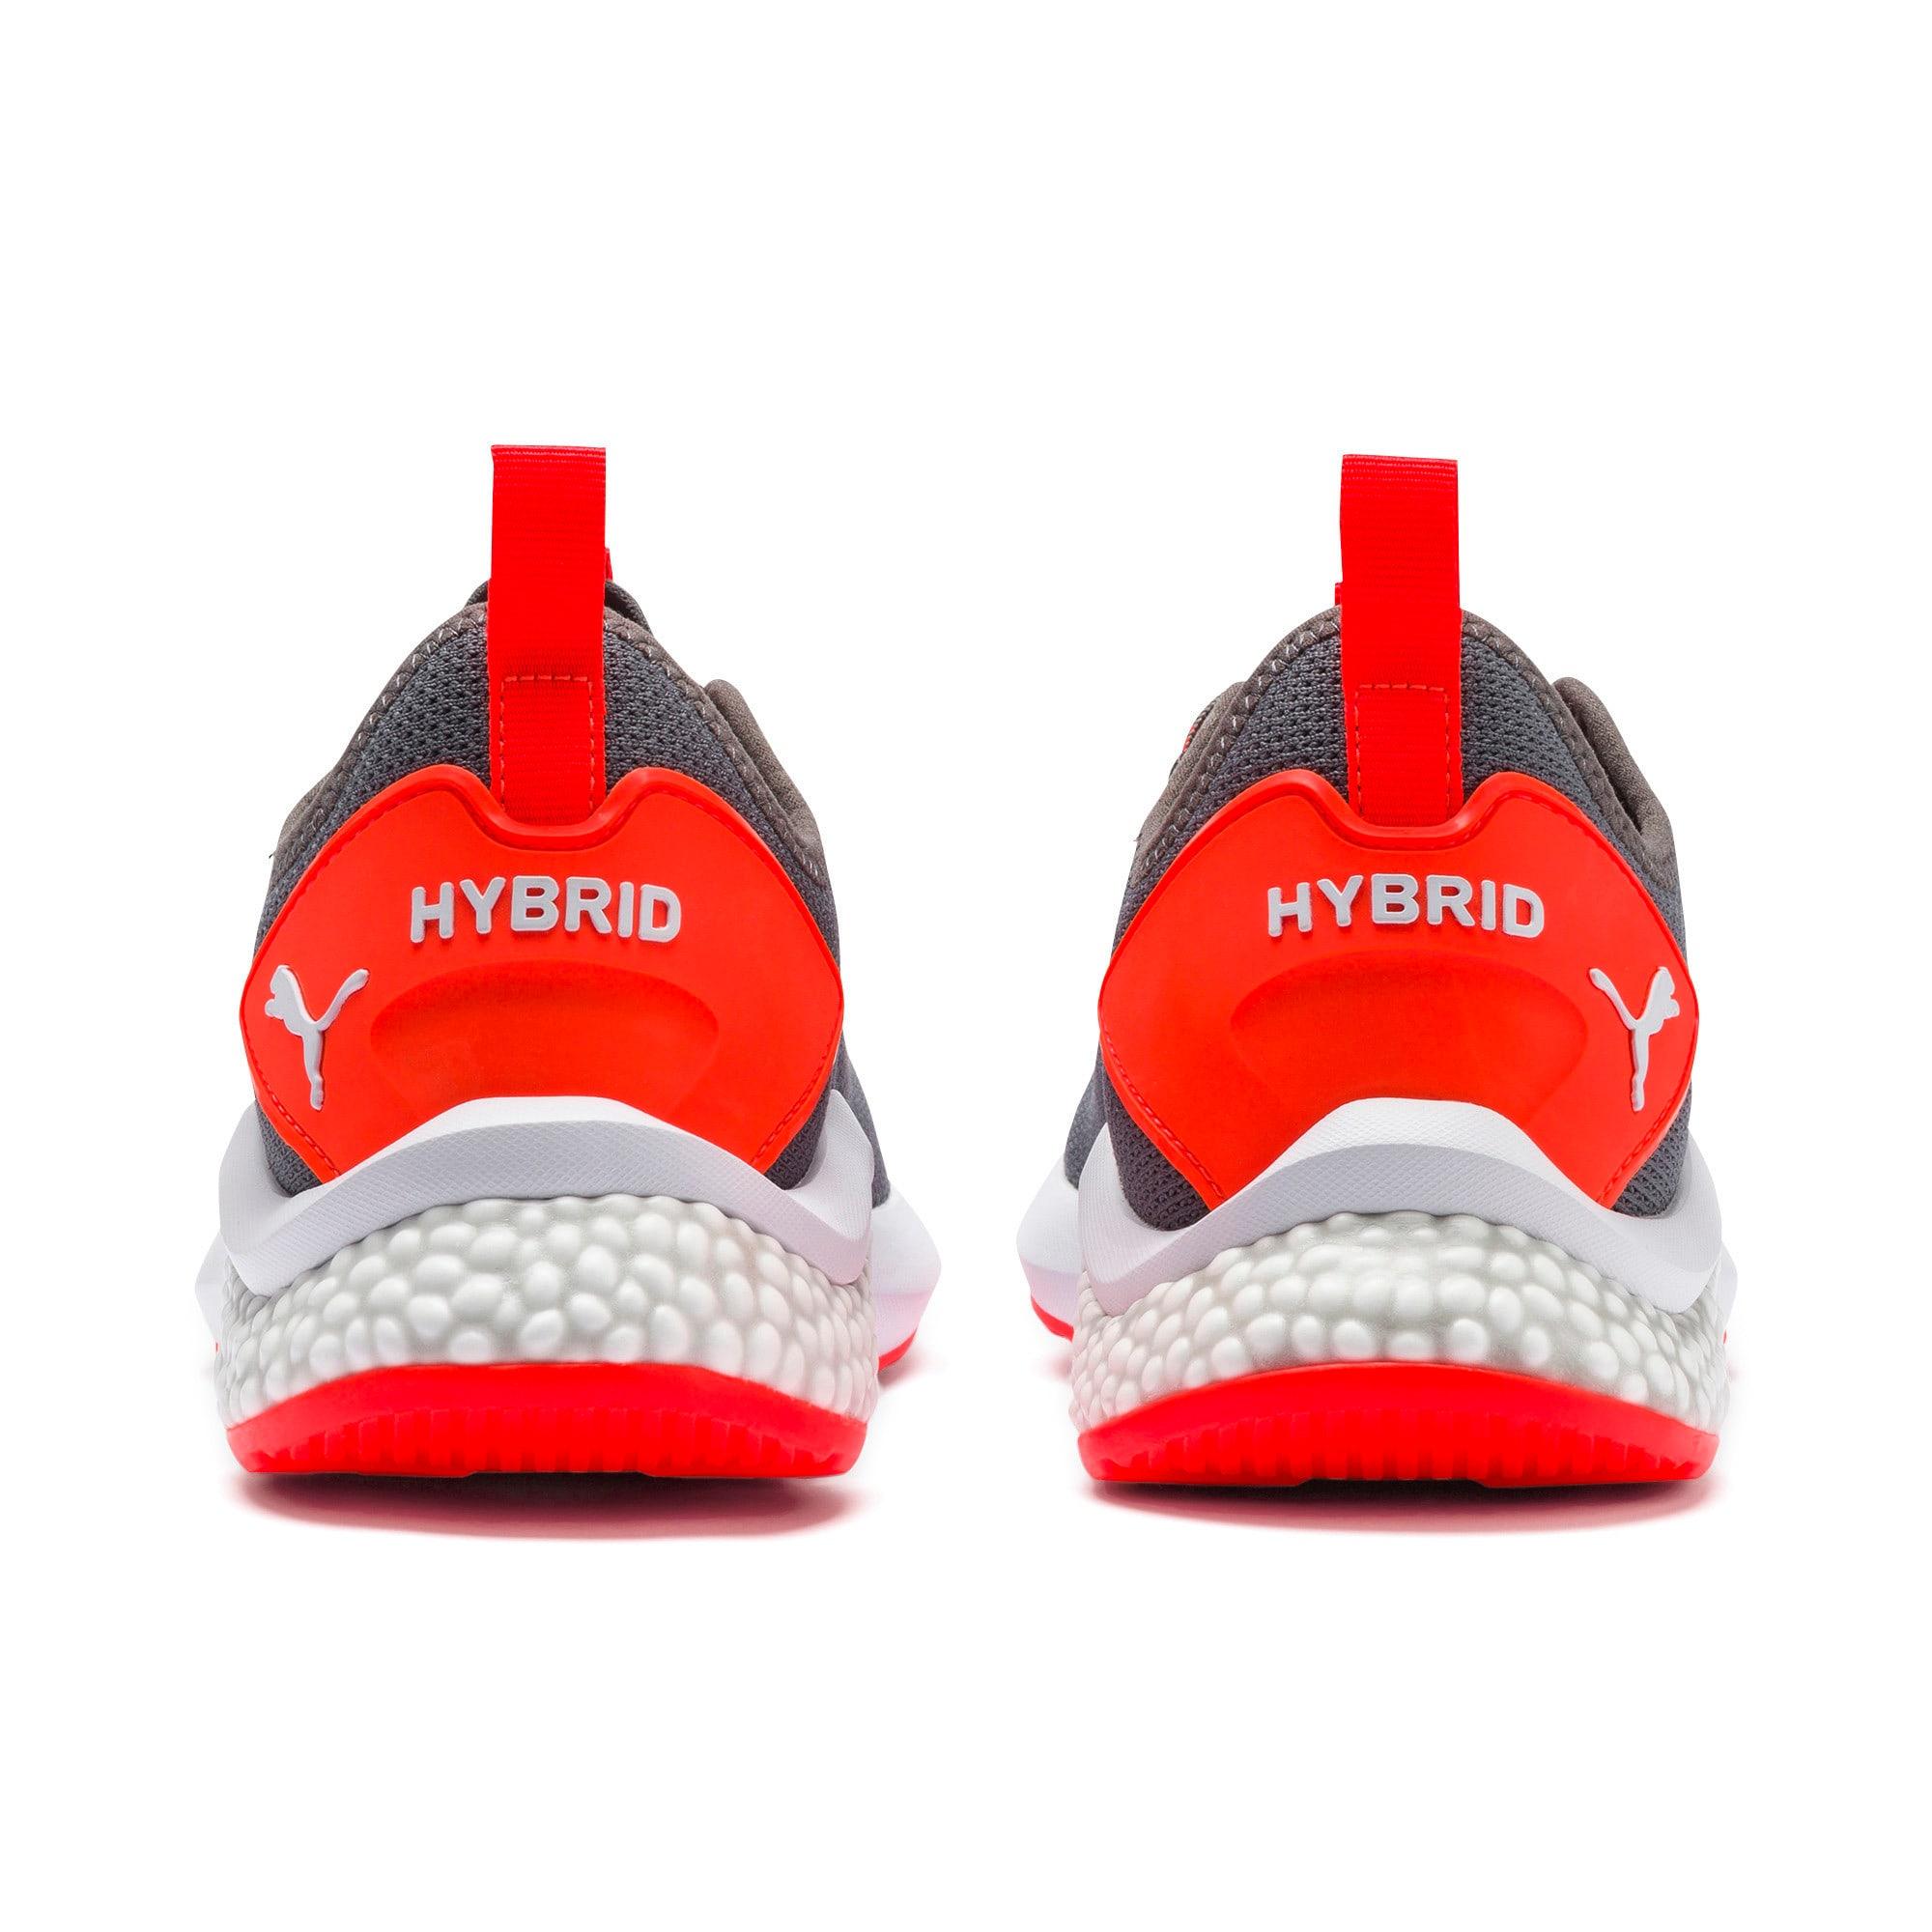 Thumbnail 4 of HYBRID NX Men's Running Shoes, CASTLEROCK-Nrgy Red, medium